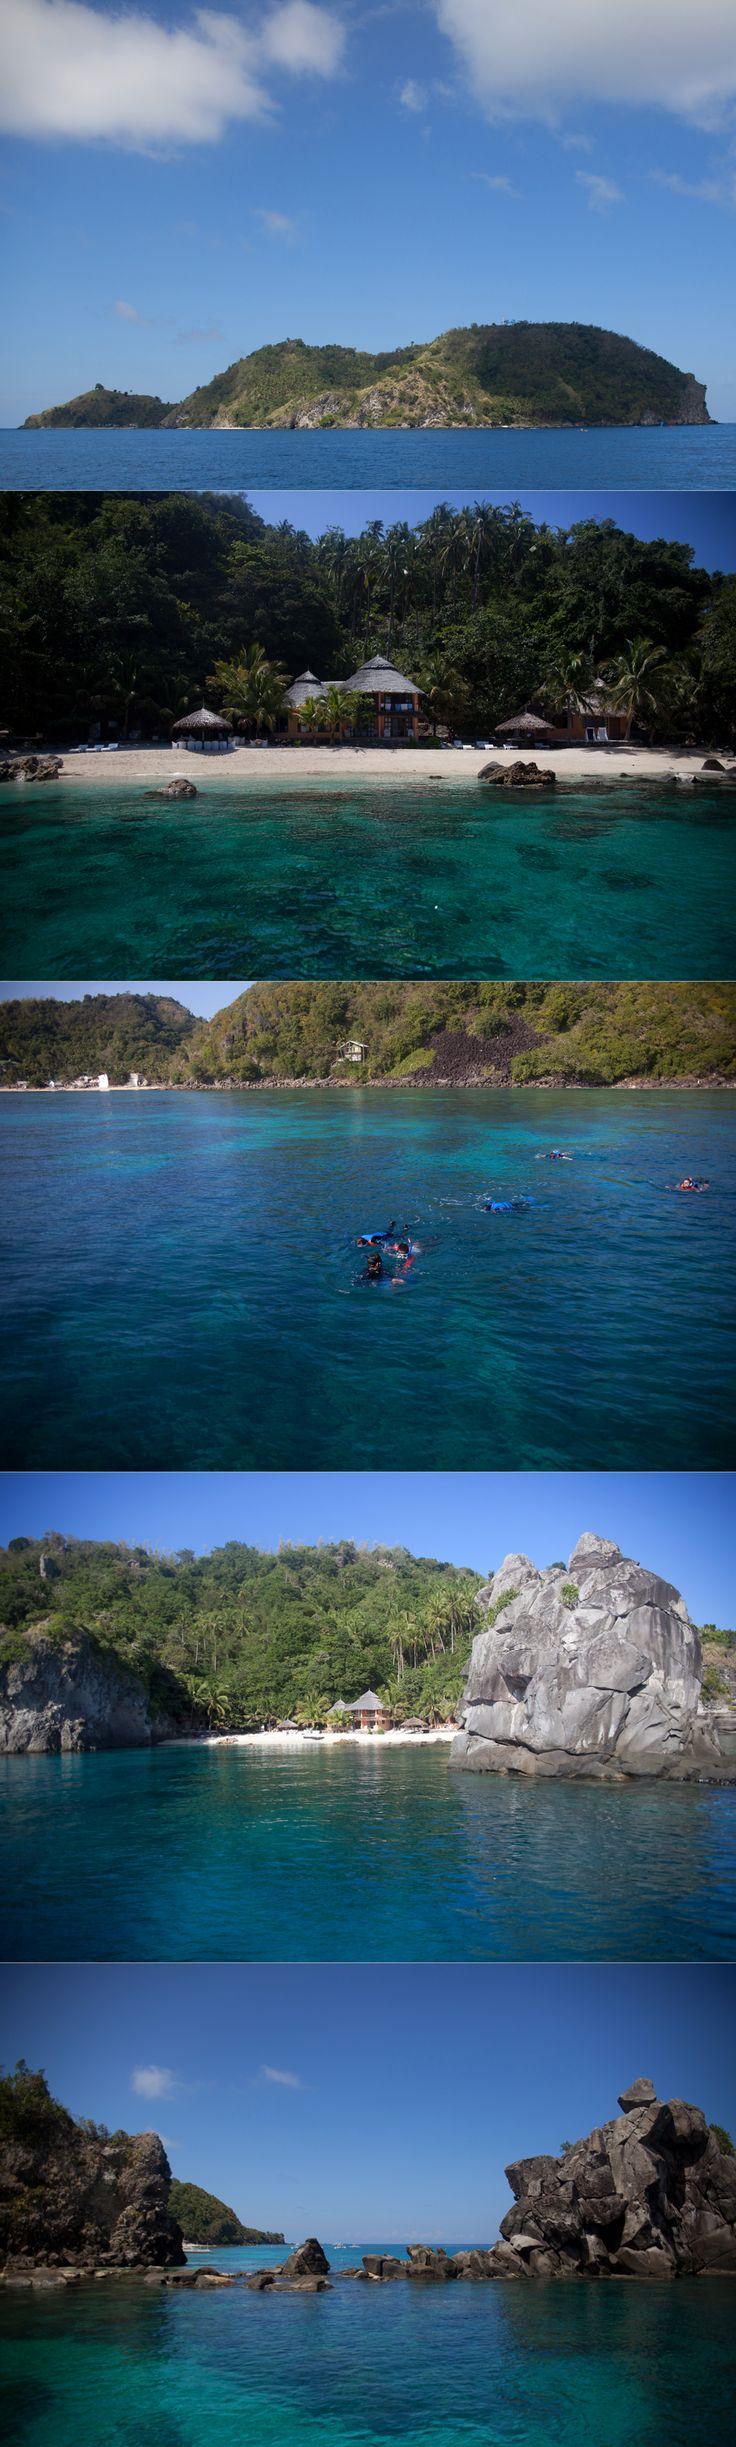 The Philippines pt 22 // Apo Island - Documenting Delight